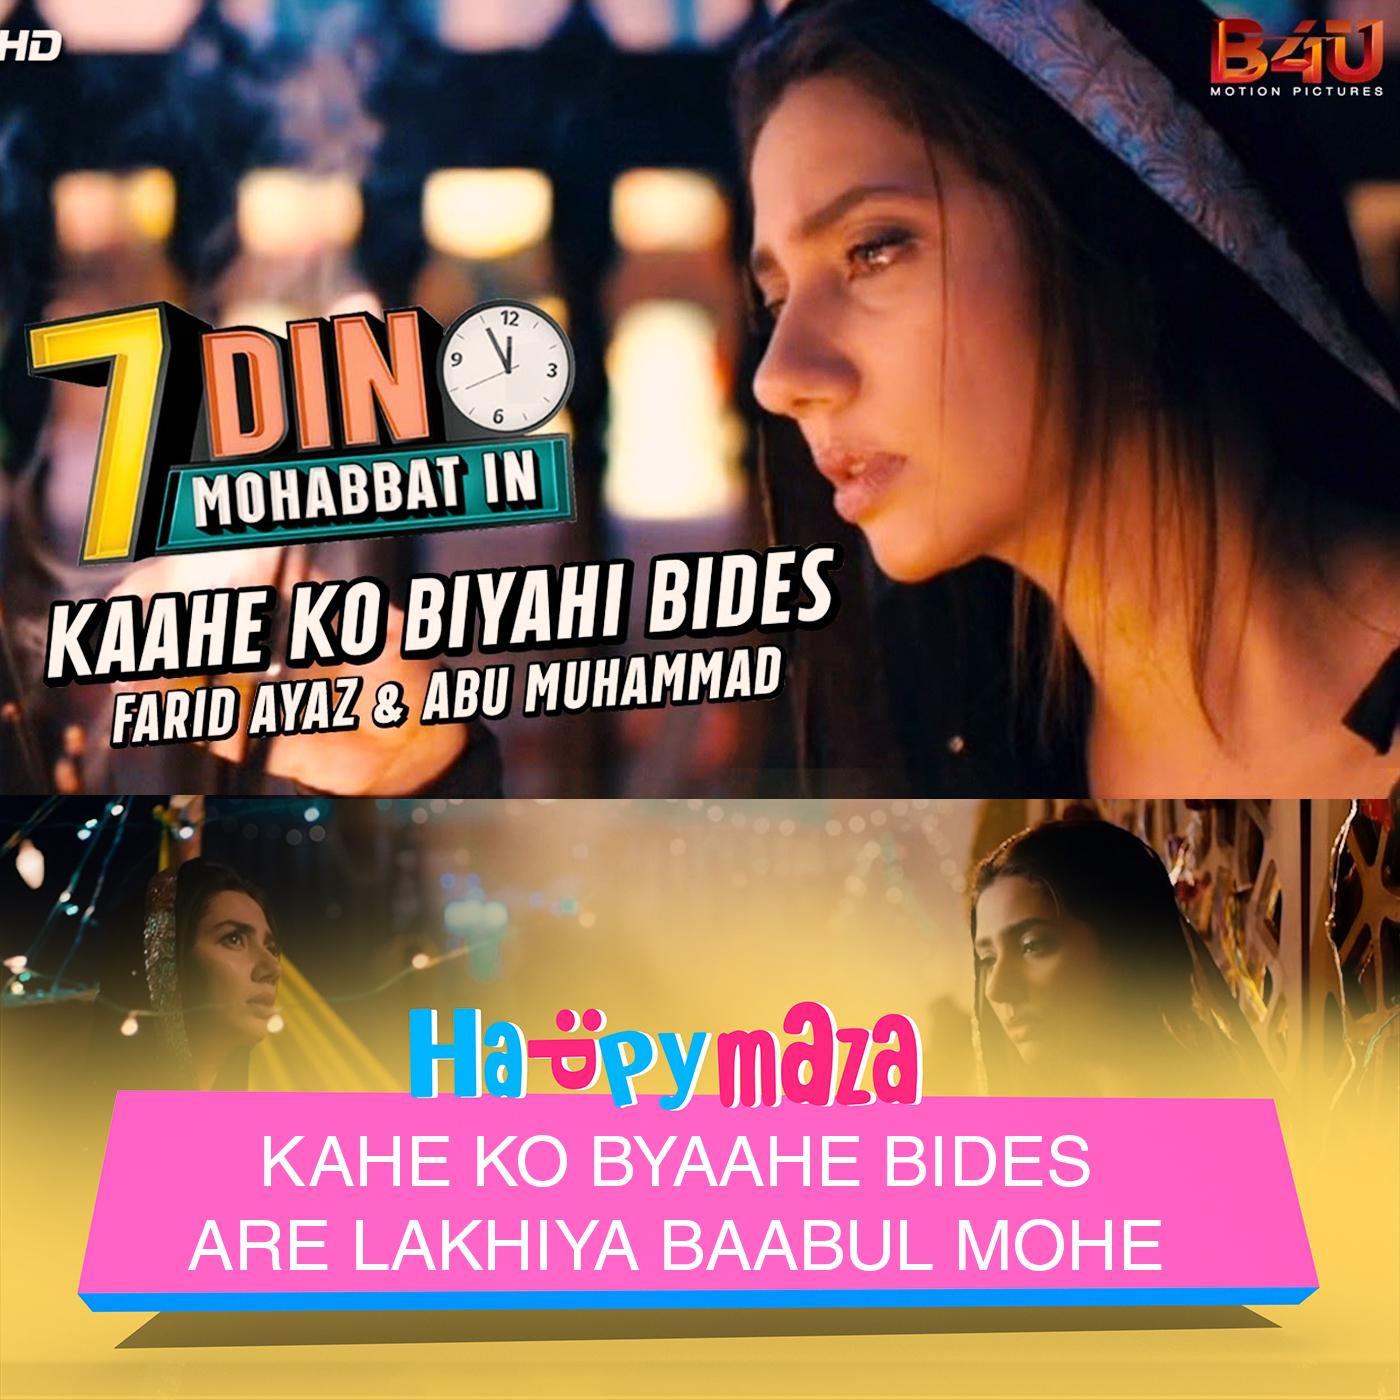 Kaahe Ko Biyahi Bides Lyrics Qawali Video - 7 Din Mohabbat In 2018